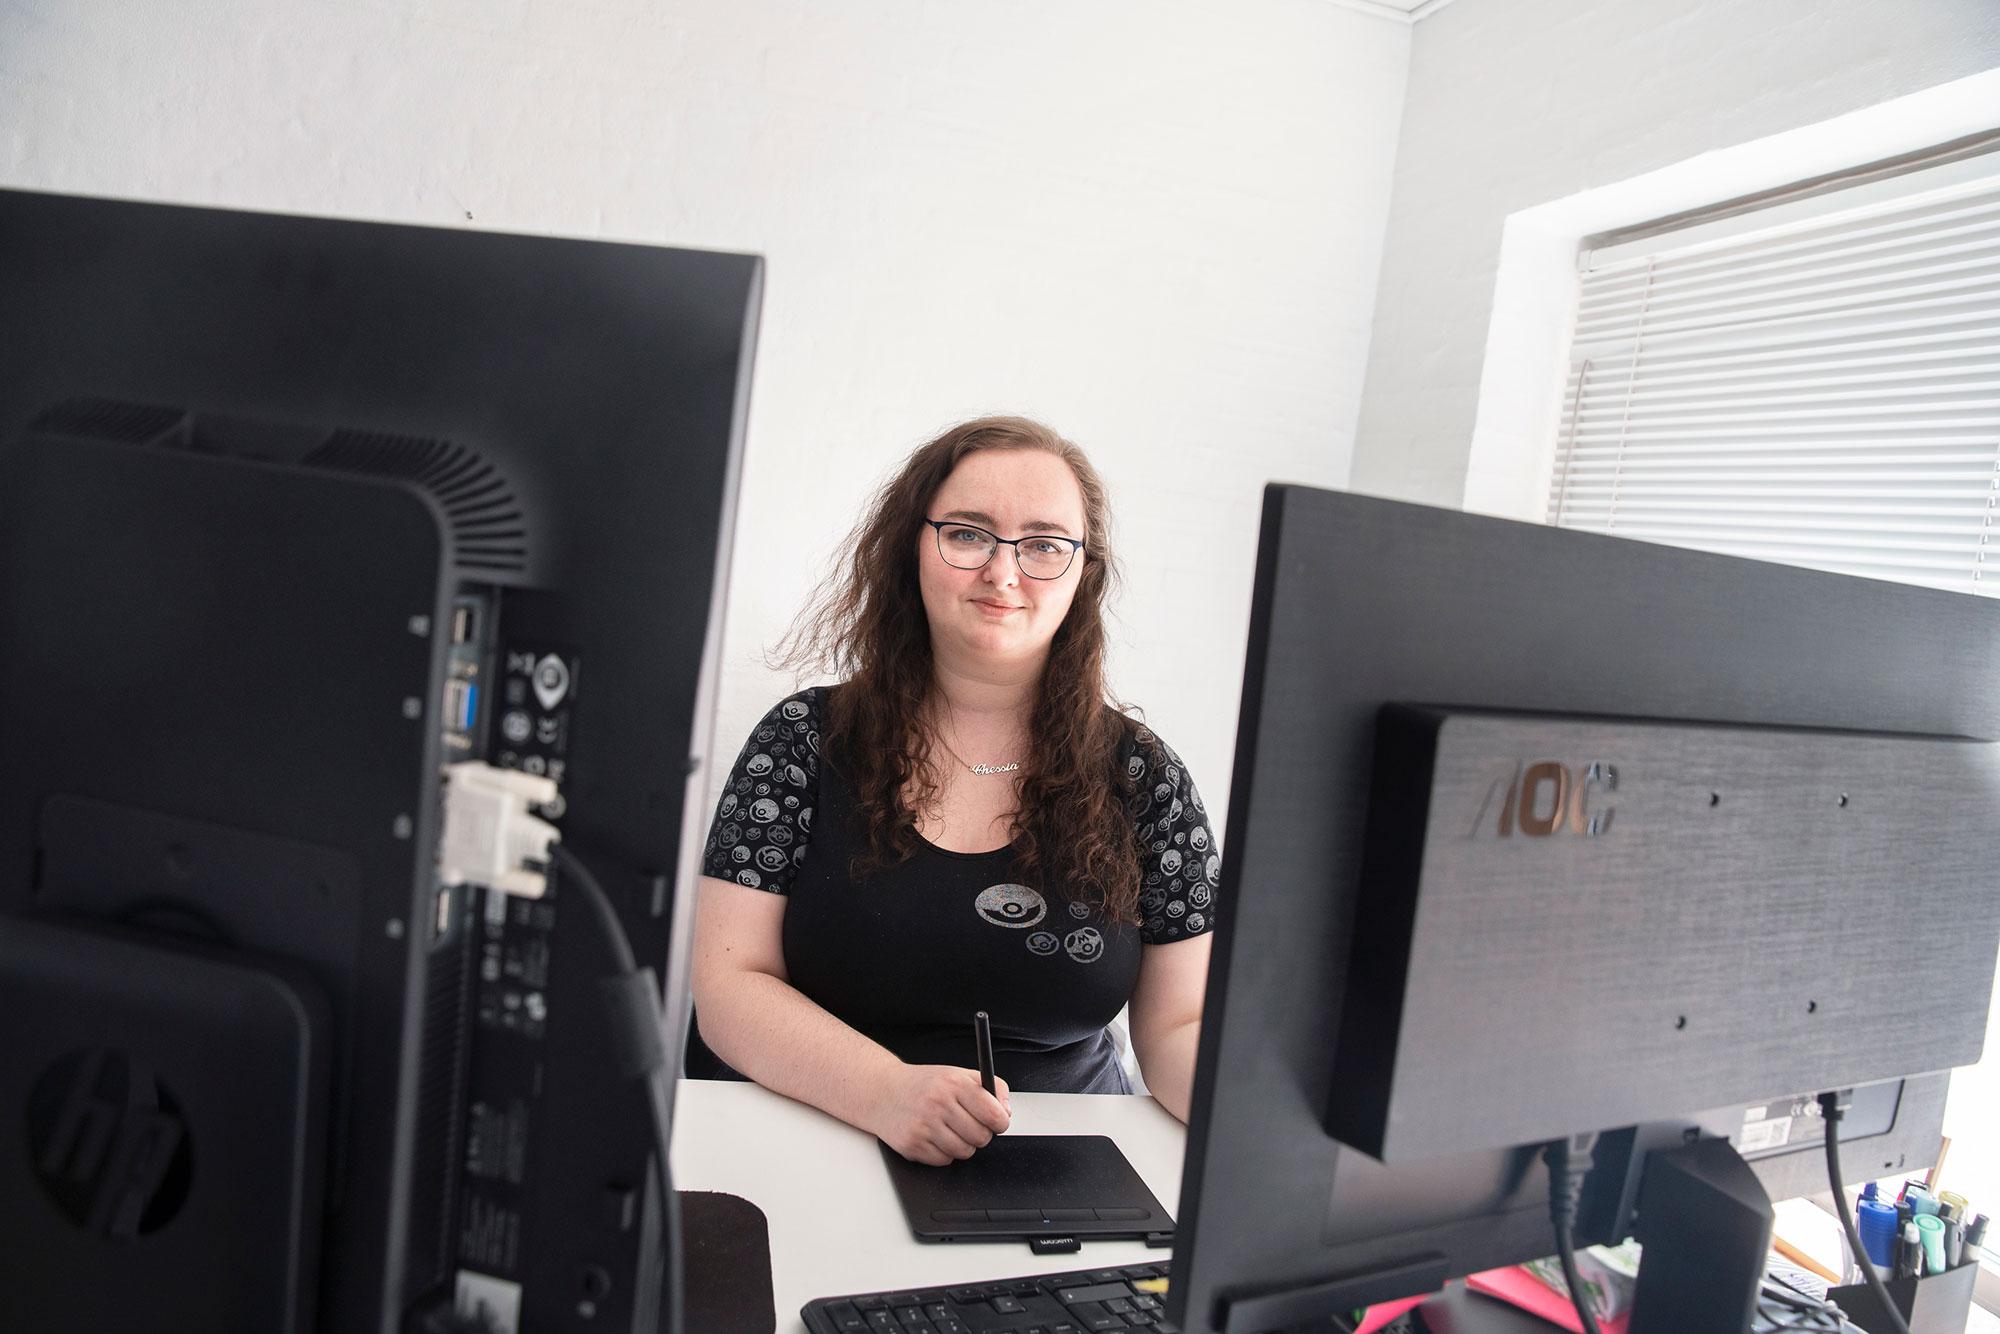 Janni Altmann siddende bag 2 computerskærme